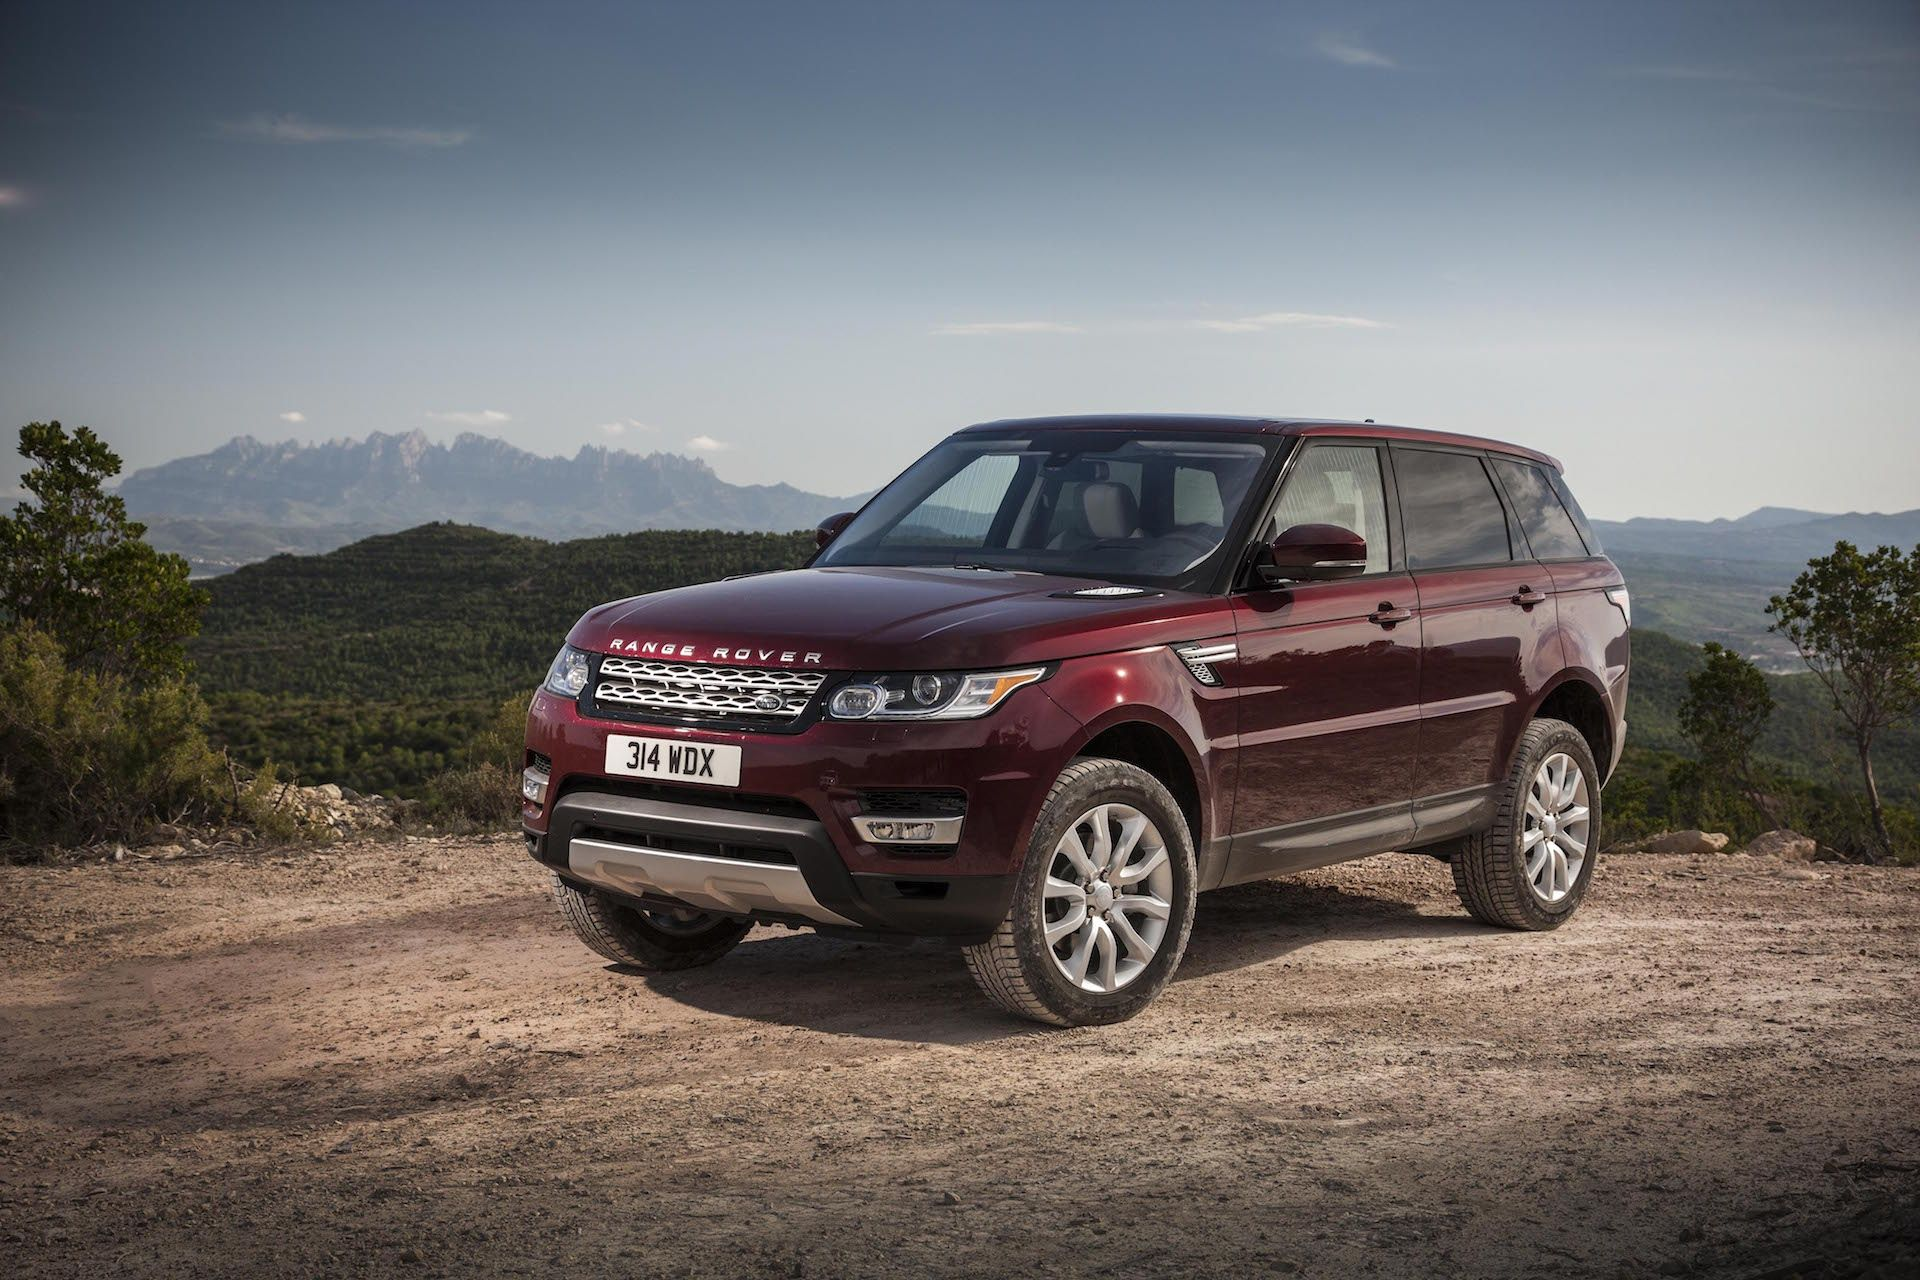 2016 Land Rover Range Rover Sport Range Rover Sport Range Rover Land Rover